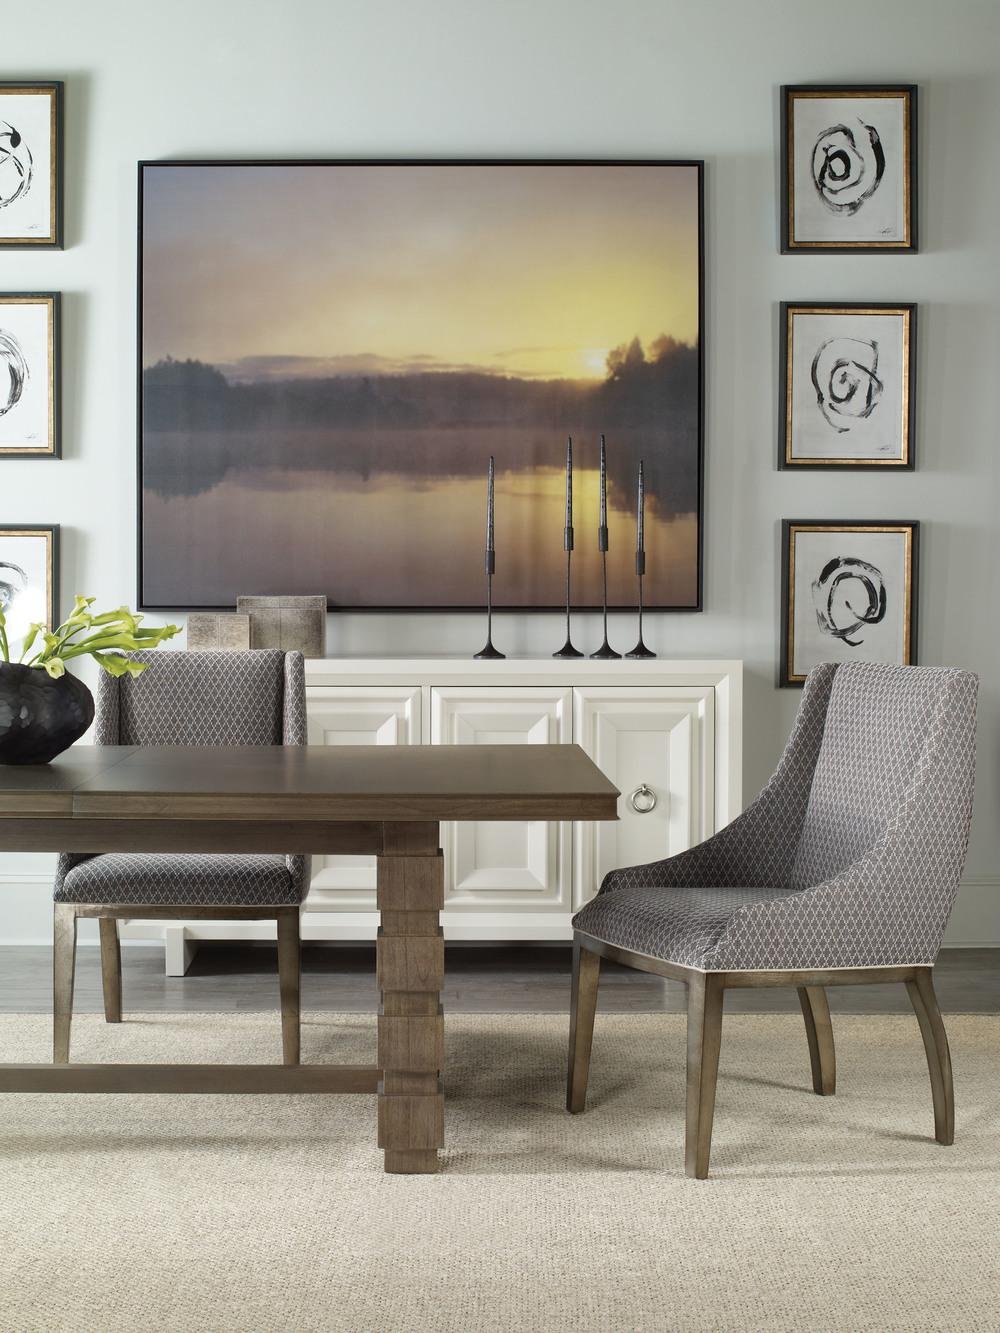 Vanguard Furniture - Durston Road Sideboard